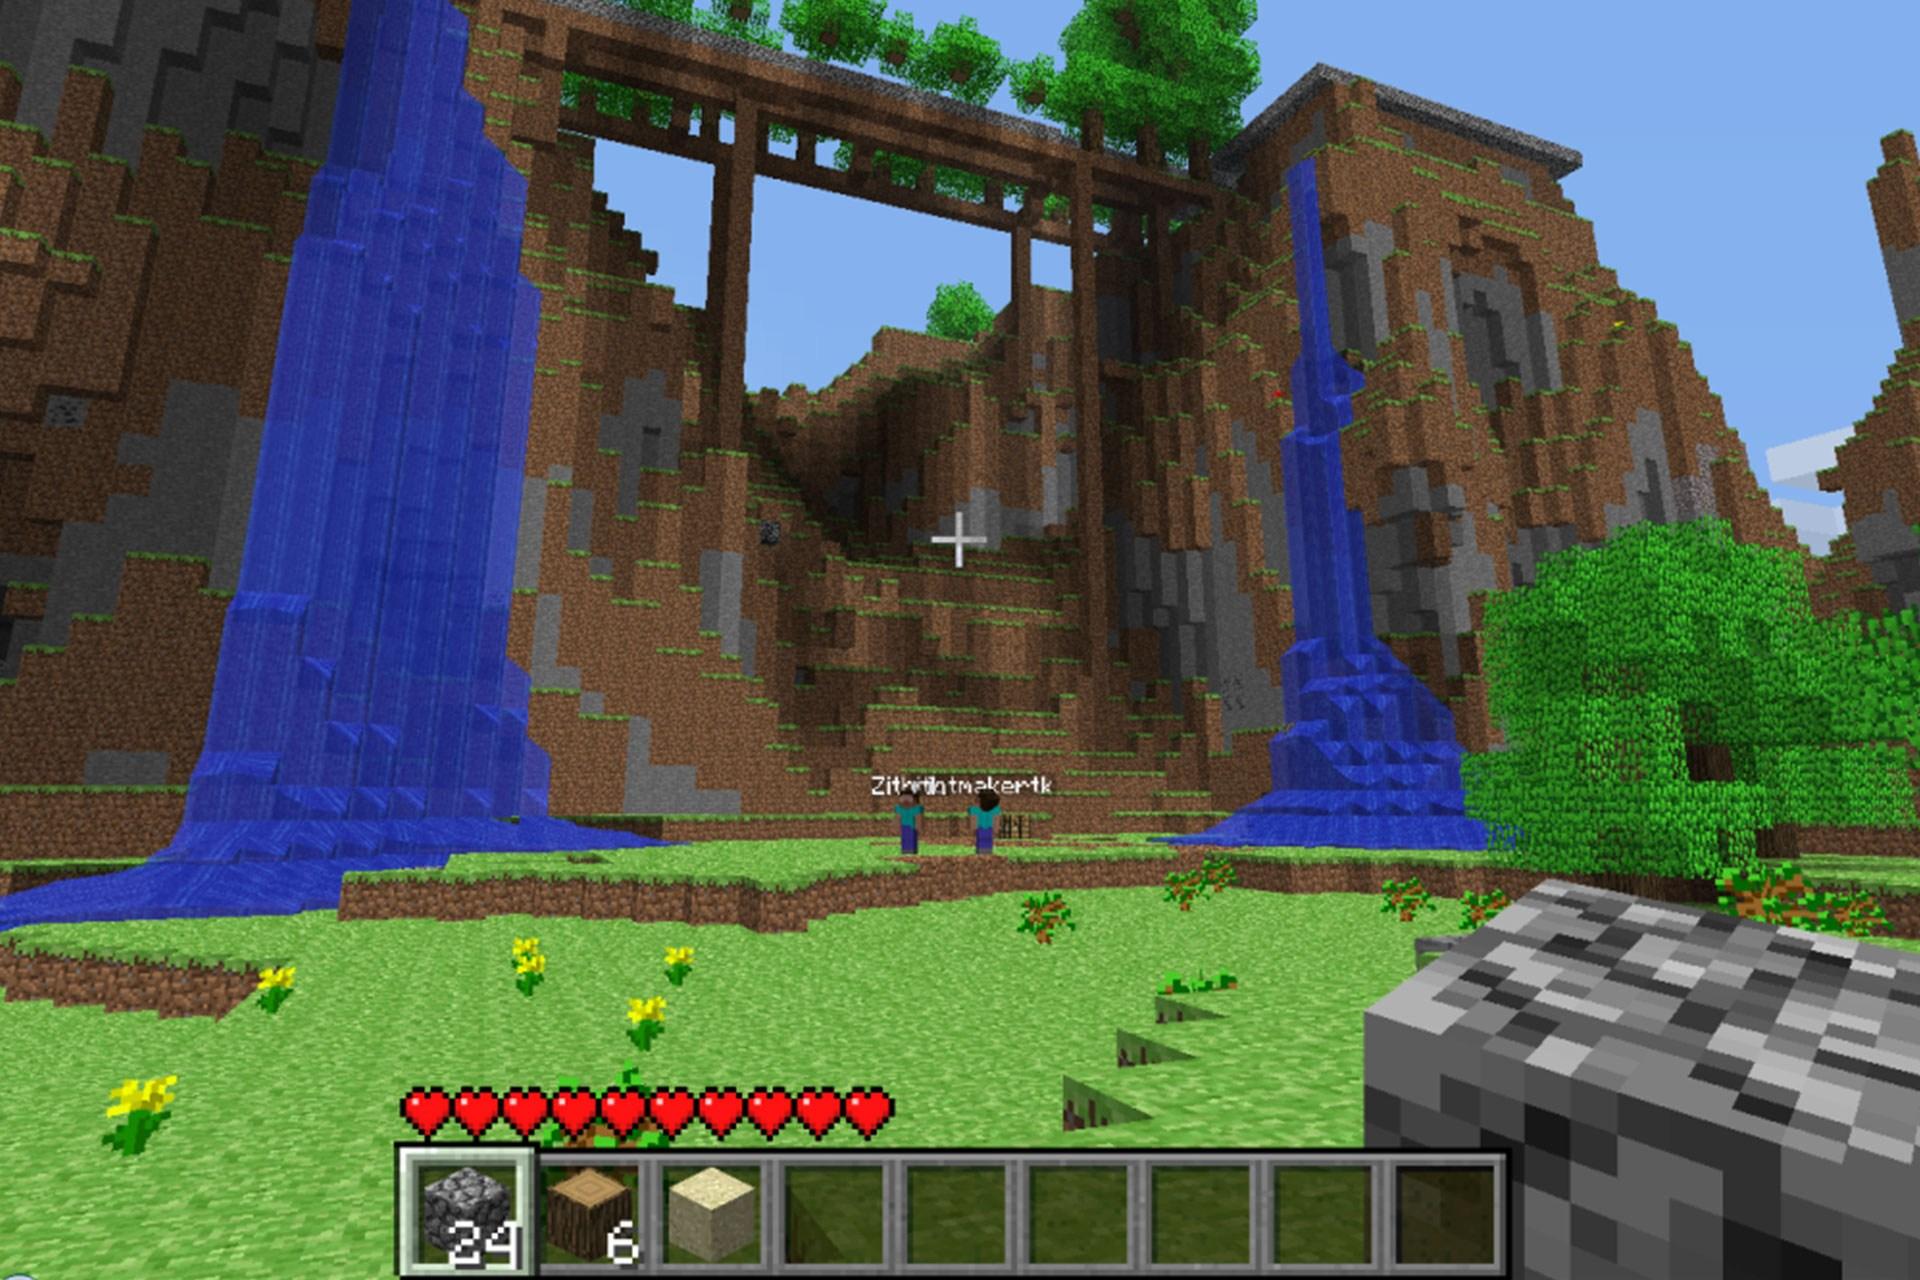 Mojang's block-building game Minecraft is still so huge.